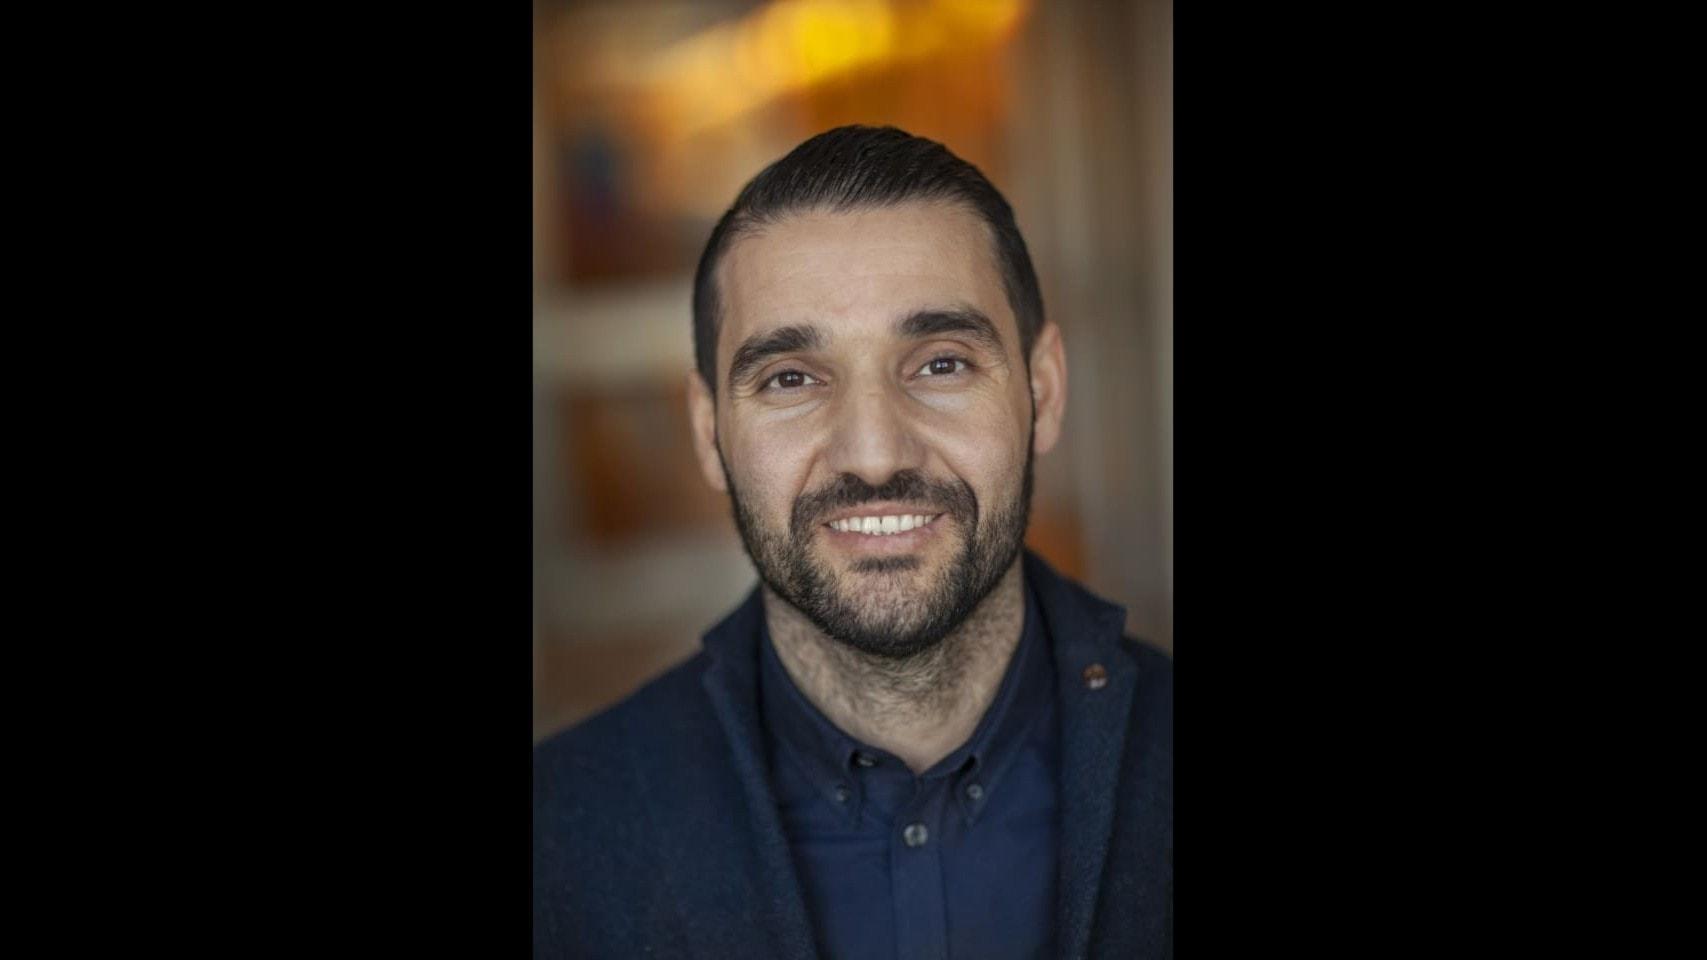 Karwan vann stora Journalistpriset i Sverige